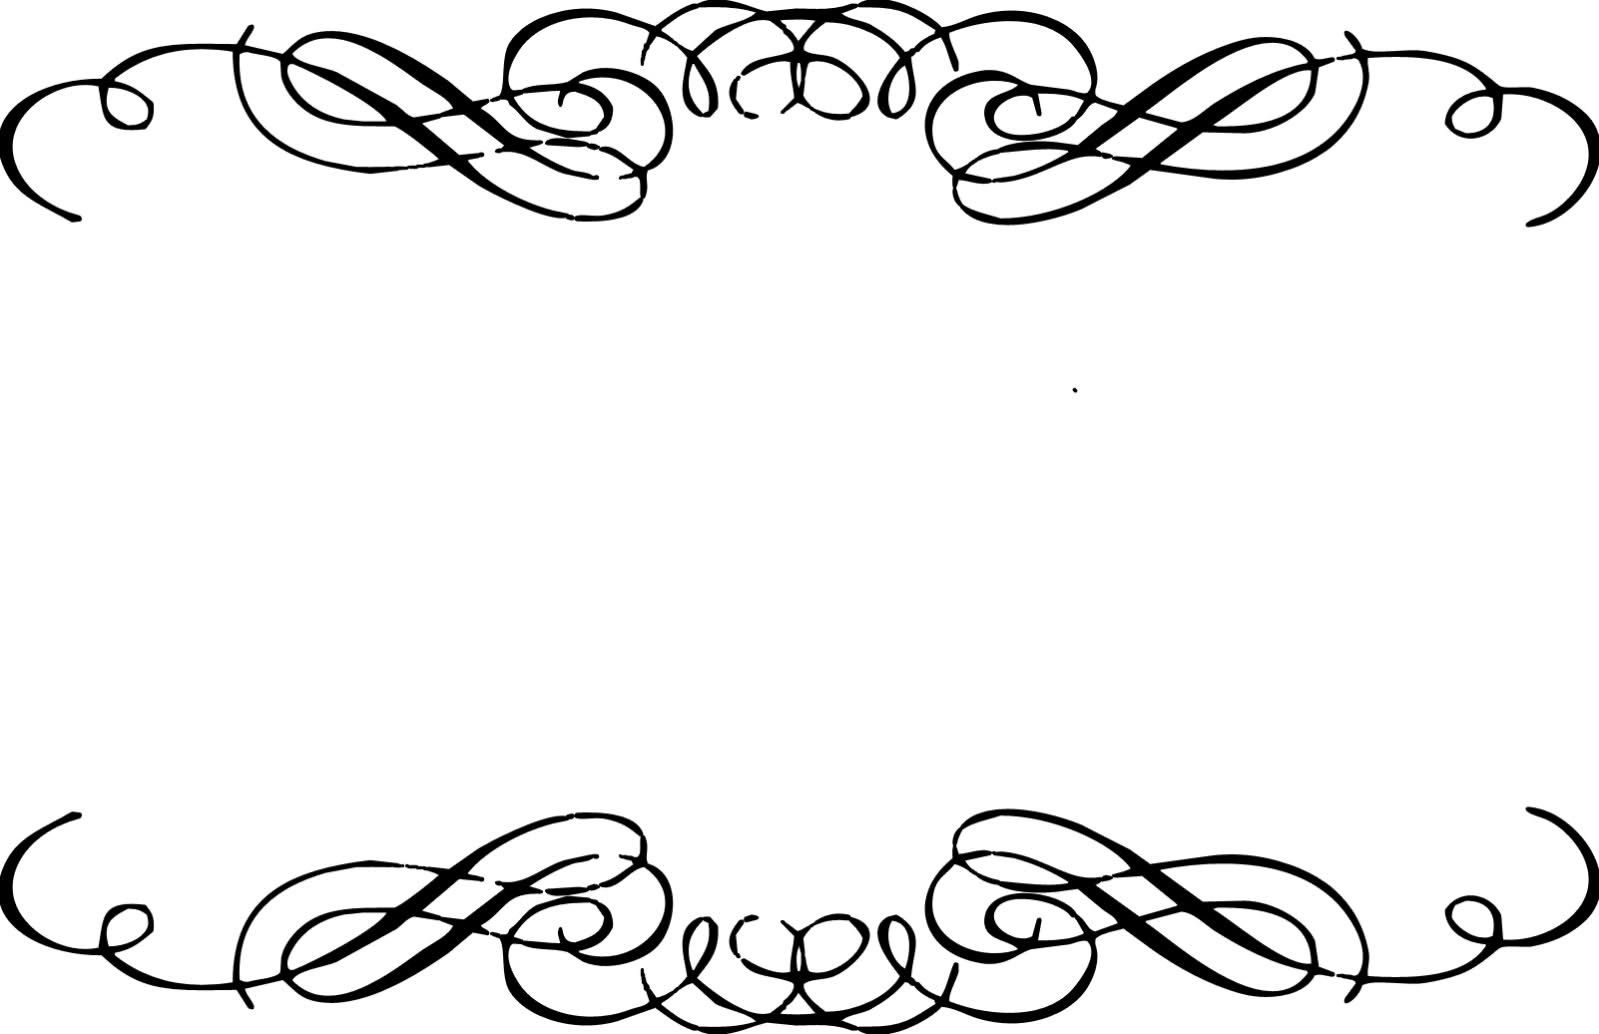 1599x1034 Decorative Borders Clipart